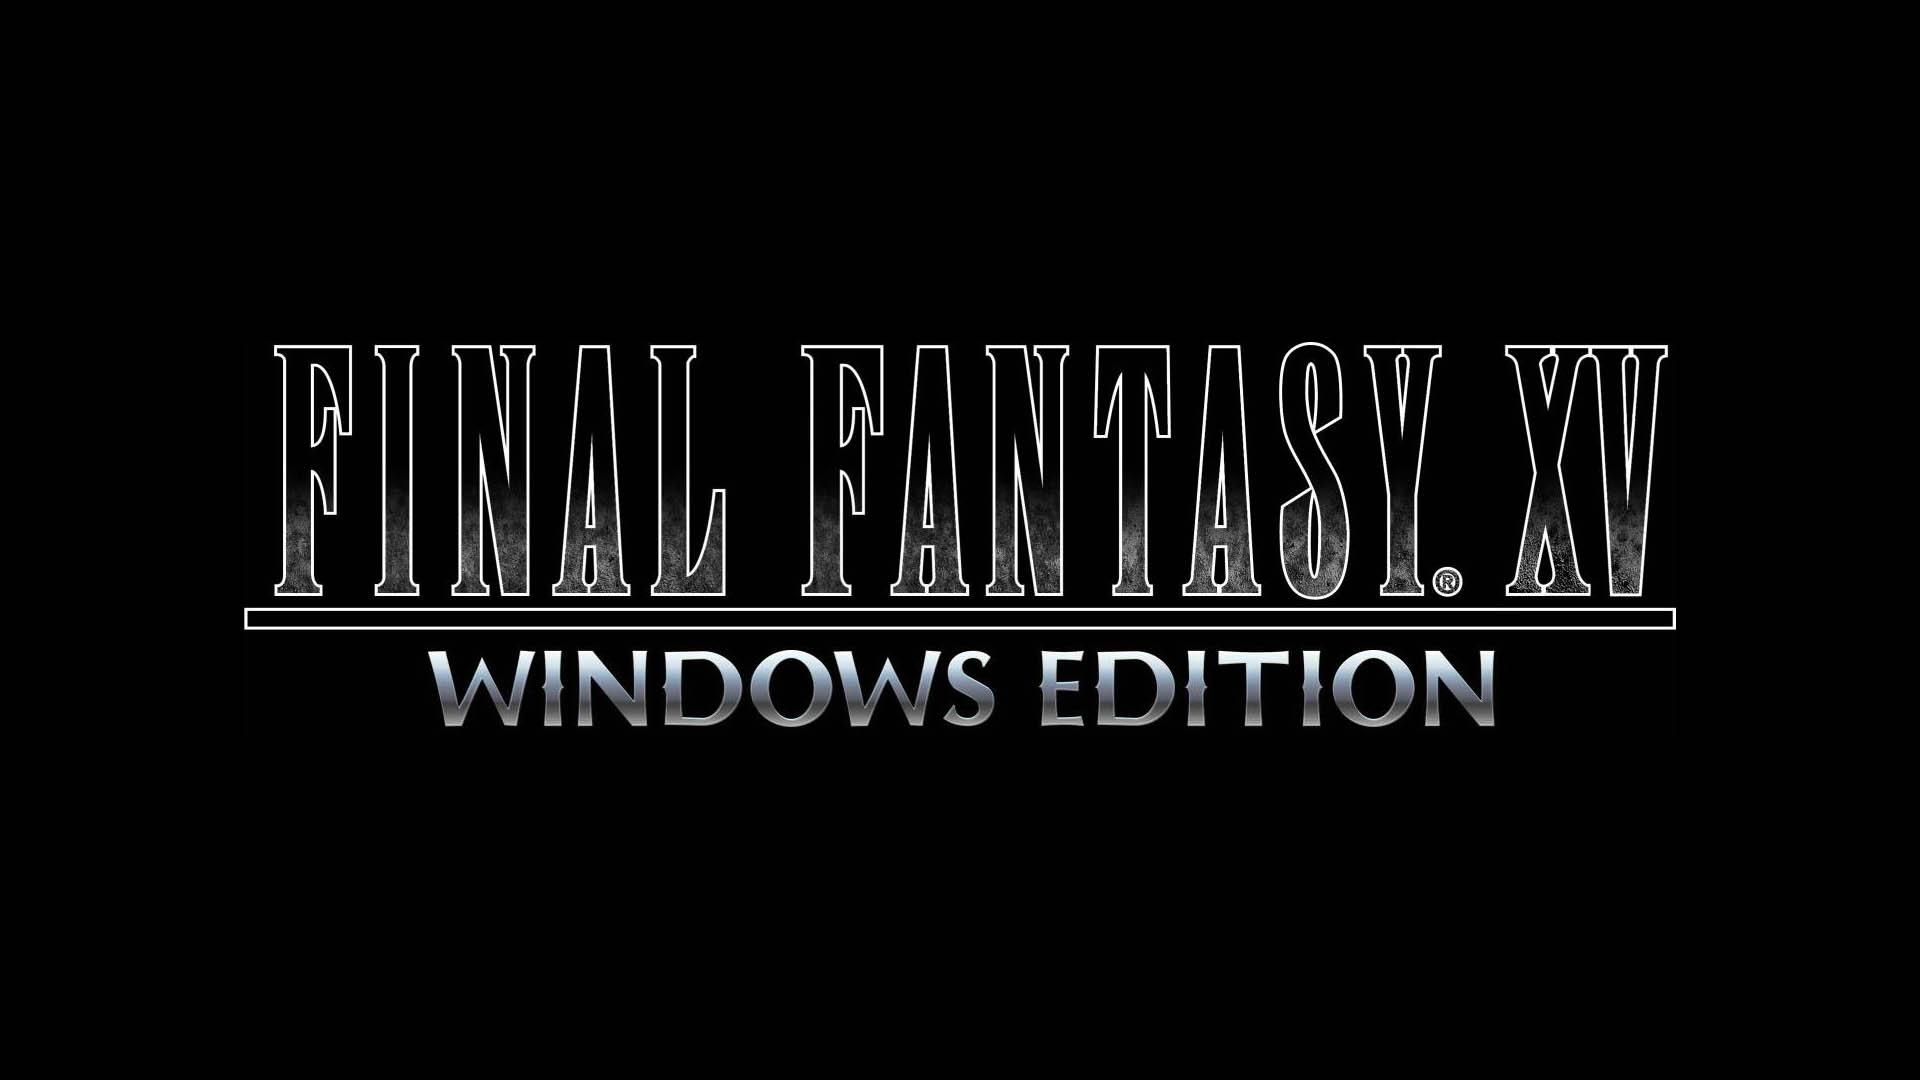 Final Fantasy 15 Königswaffen Karte.Final Fantasy Xv Windows Edition Und Royal Edition Ab Sofort